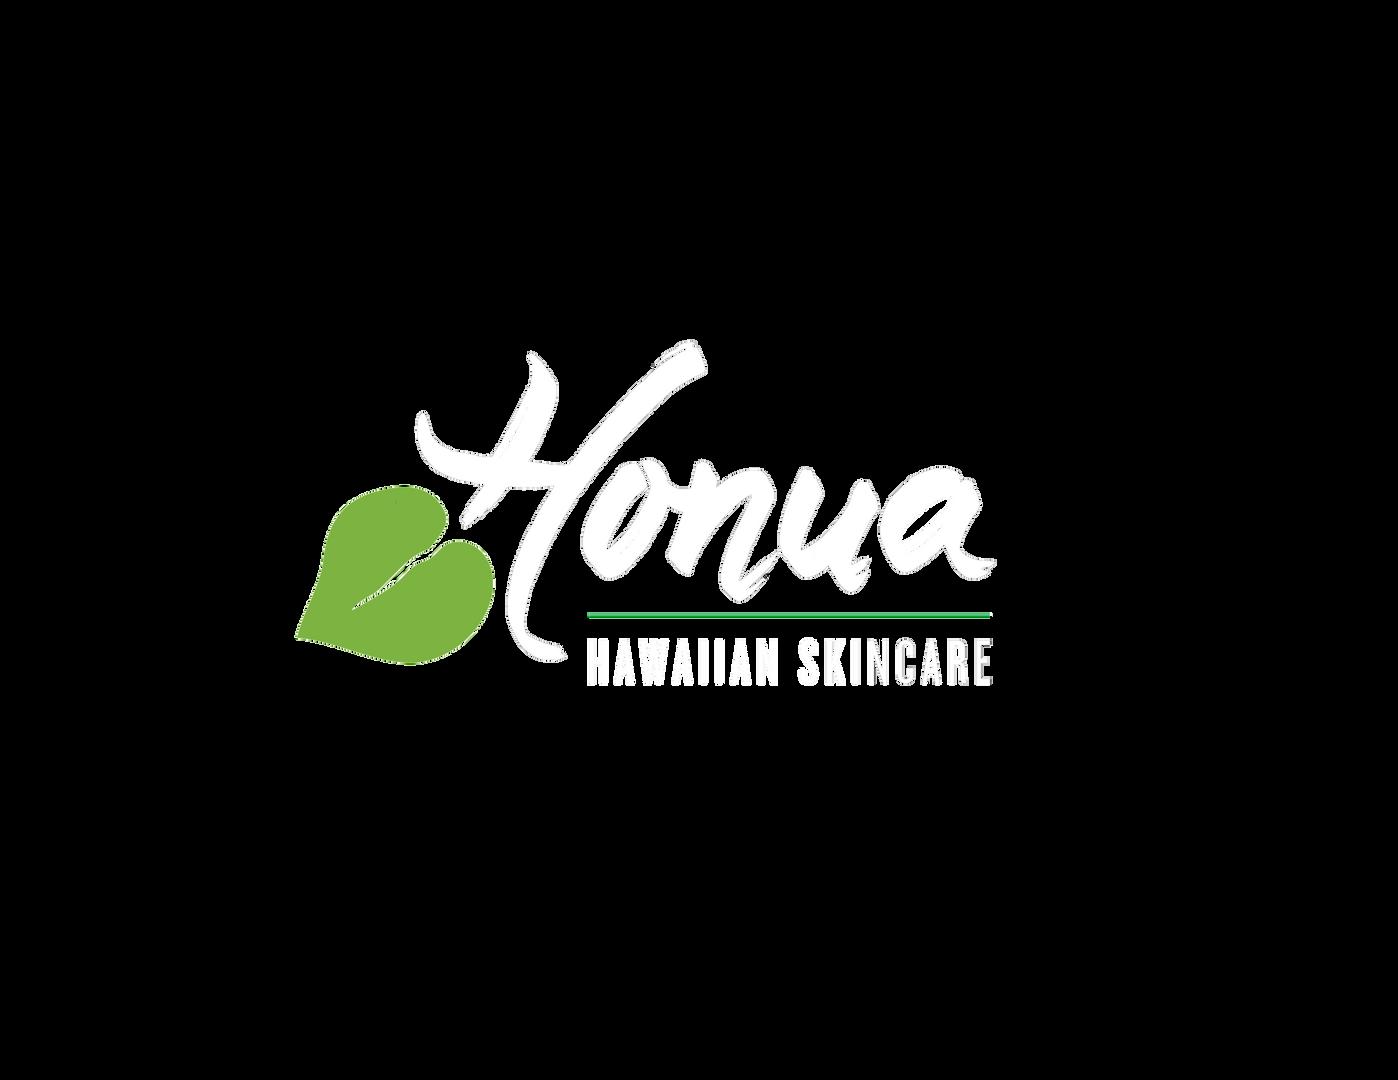 Honua-Hawaiian-Skincare-logo-LIGHT-GREEN